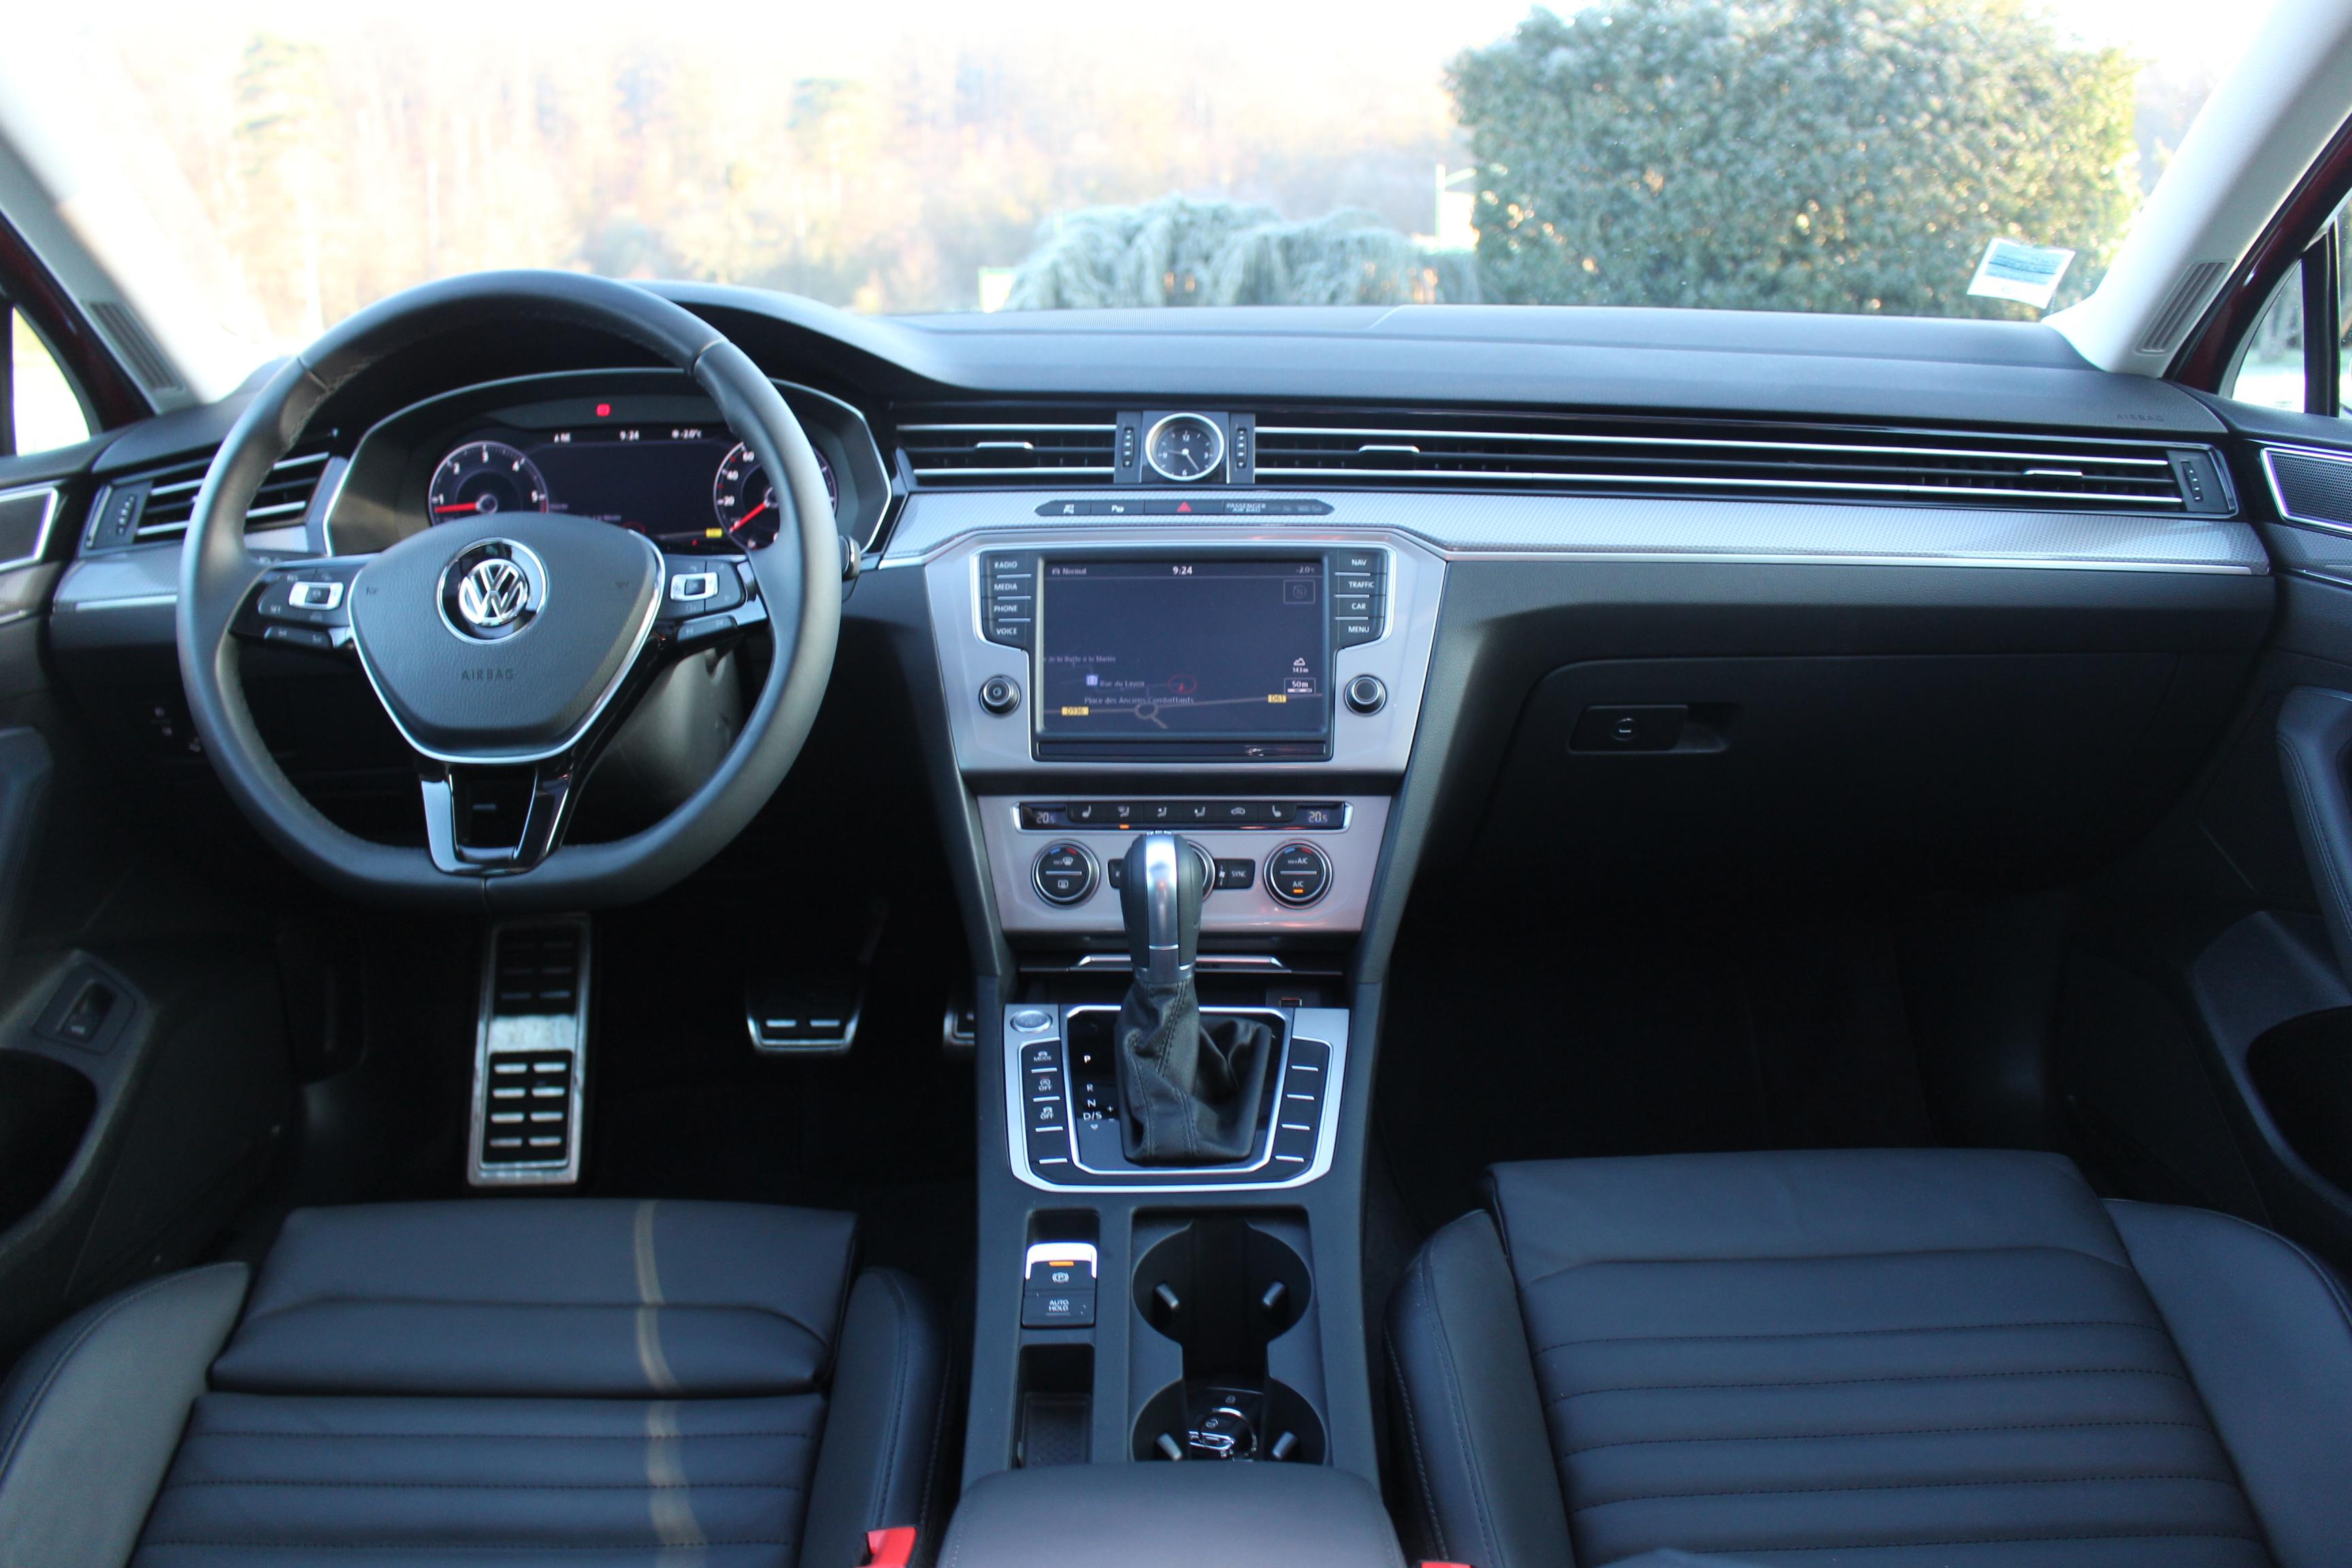 Essai Vid 233 O Volkswagen Passat Alltrack Premier De Boue